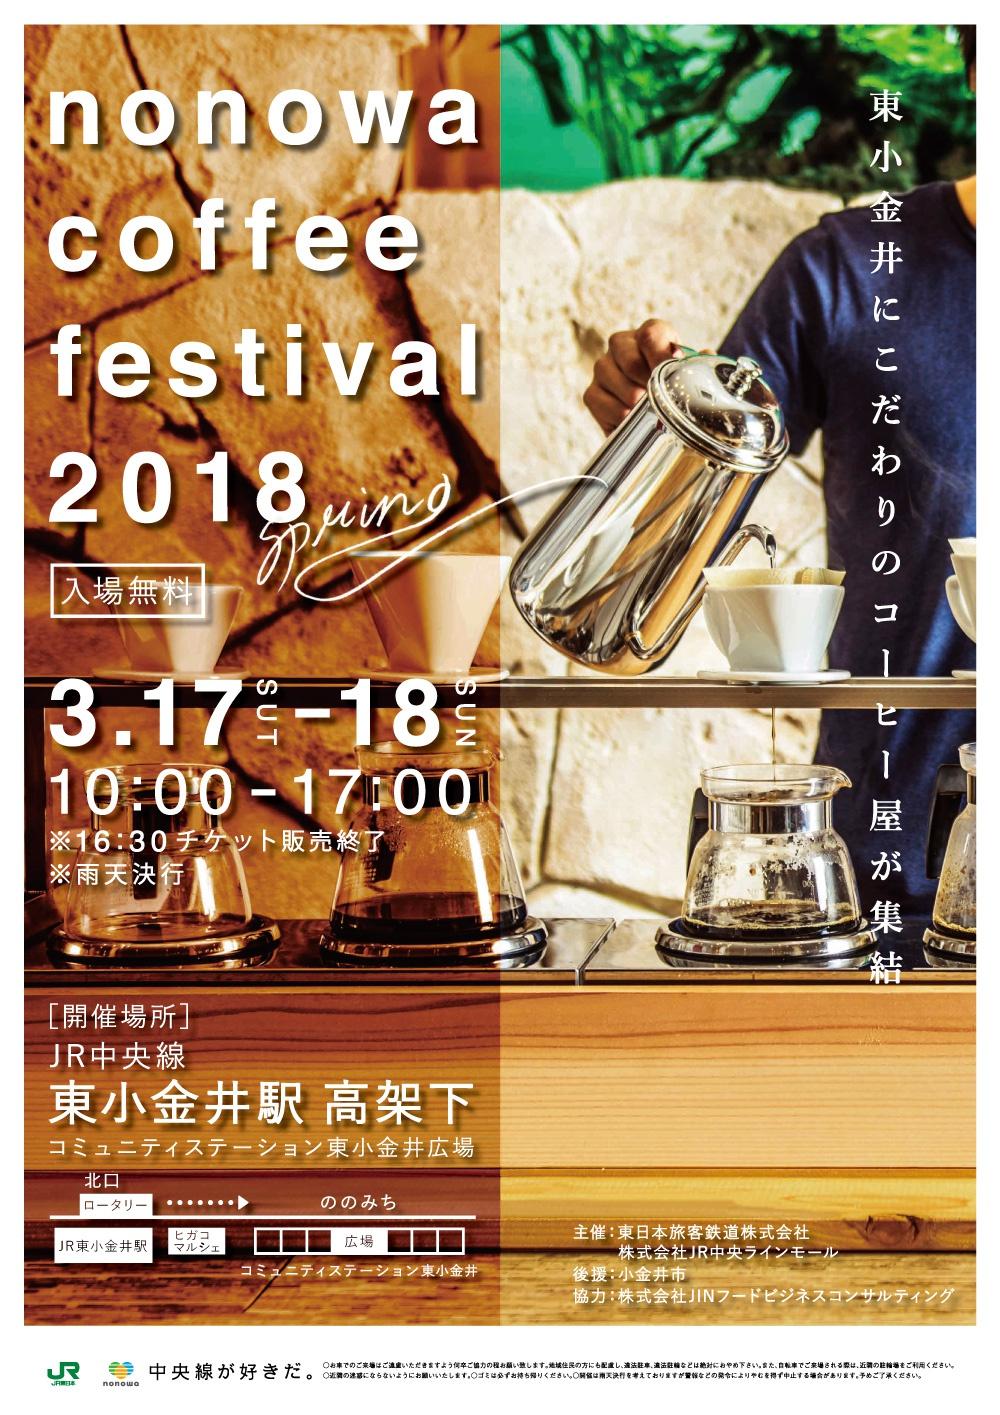 3/17・18開催! nonowa coffee festival!